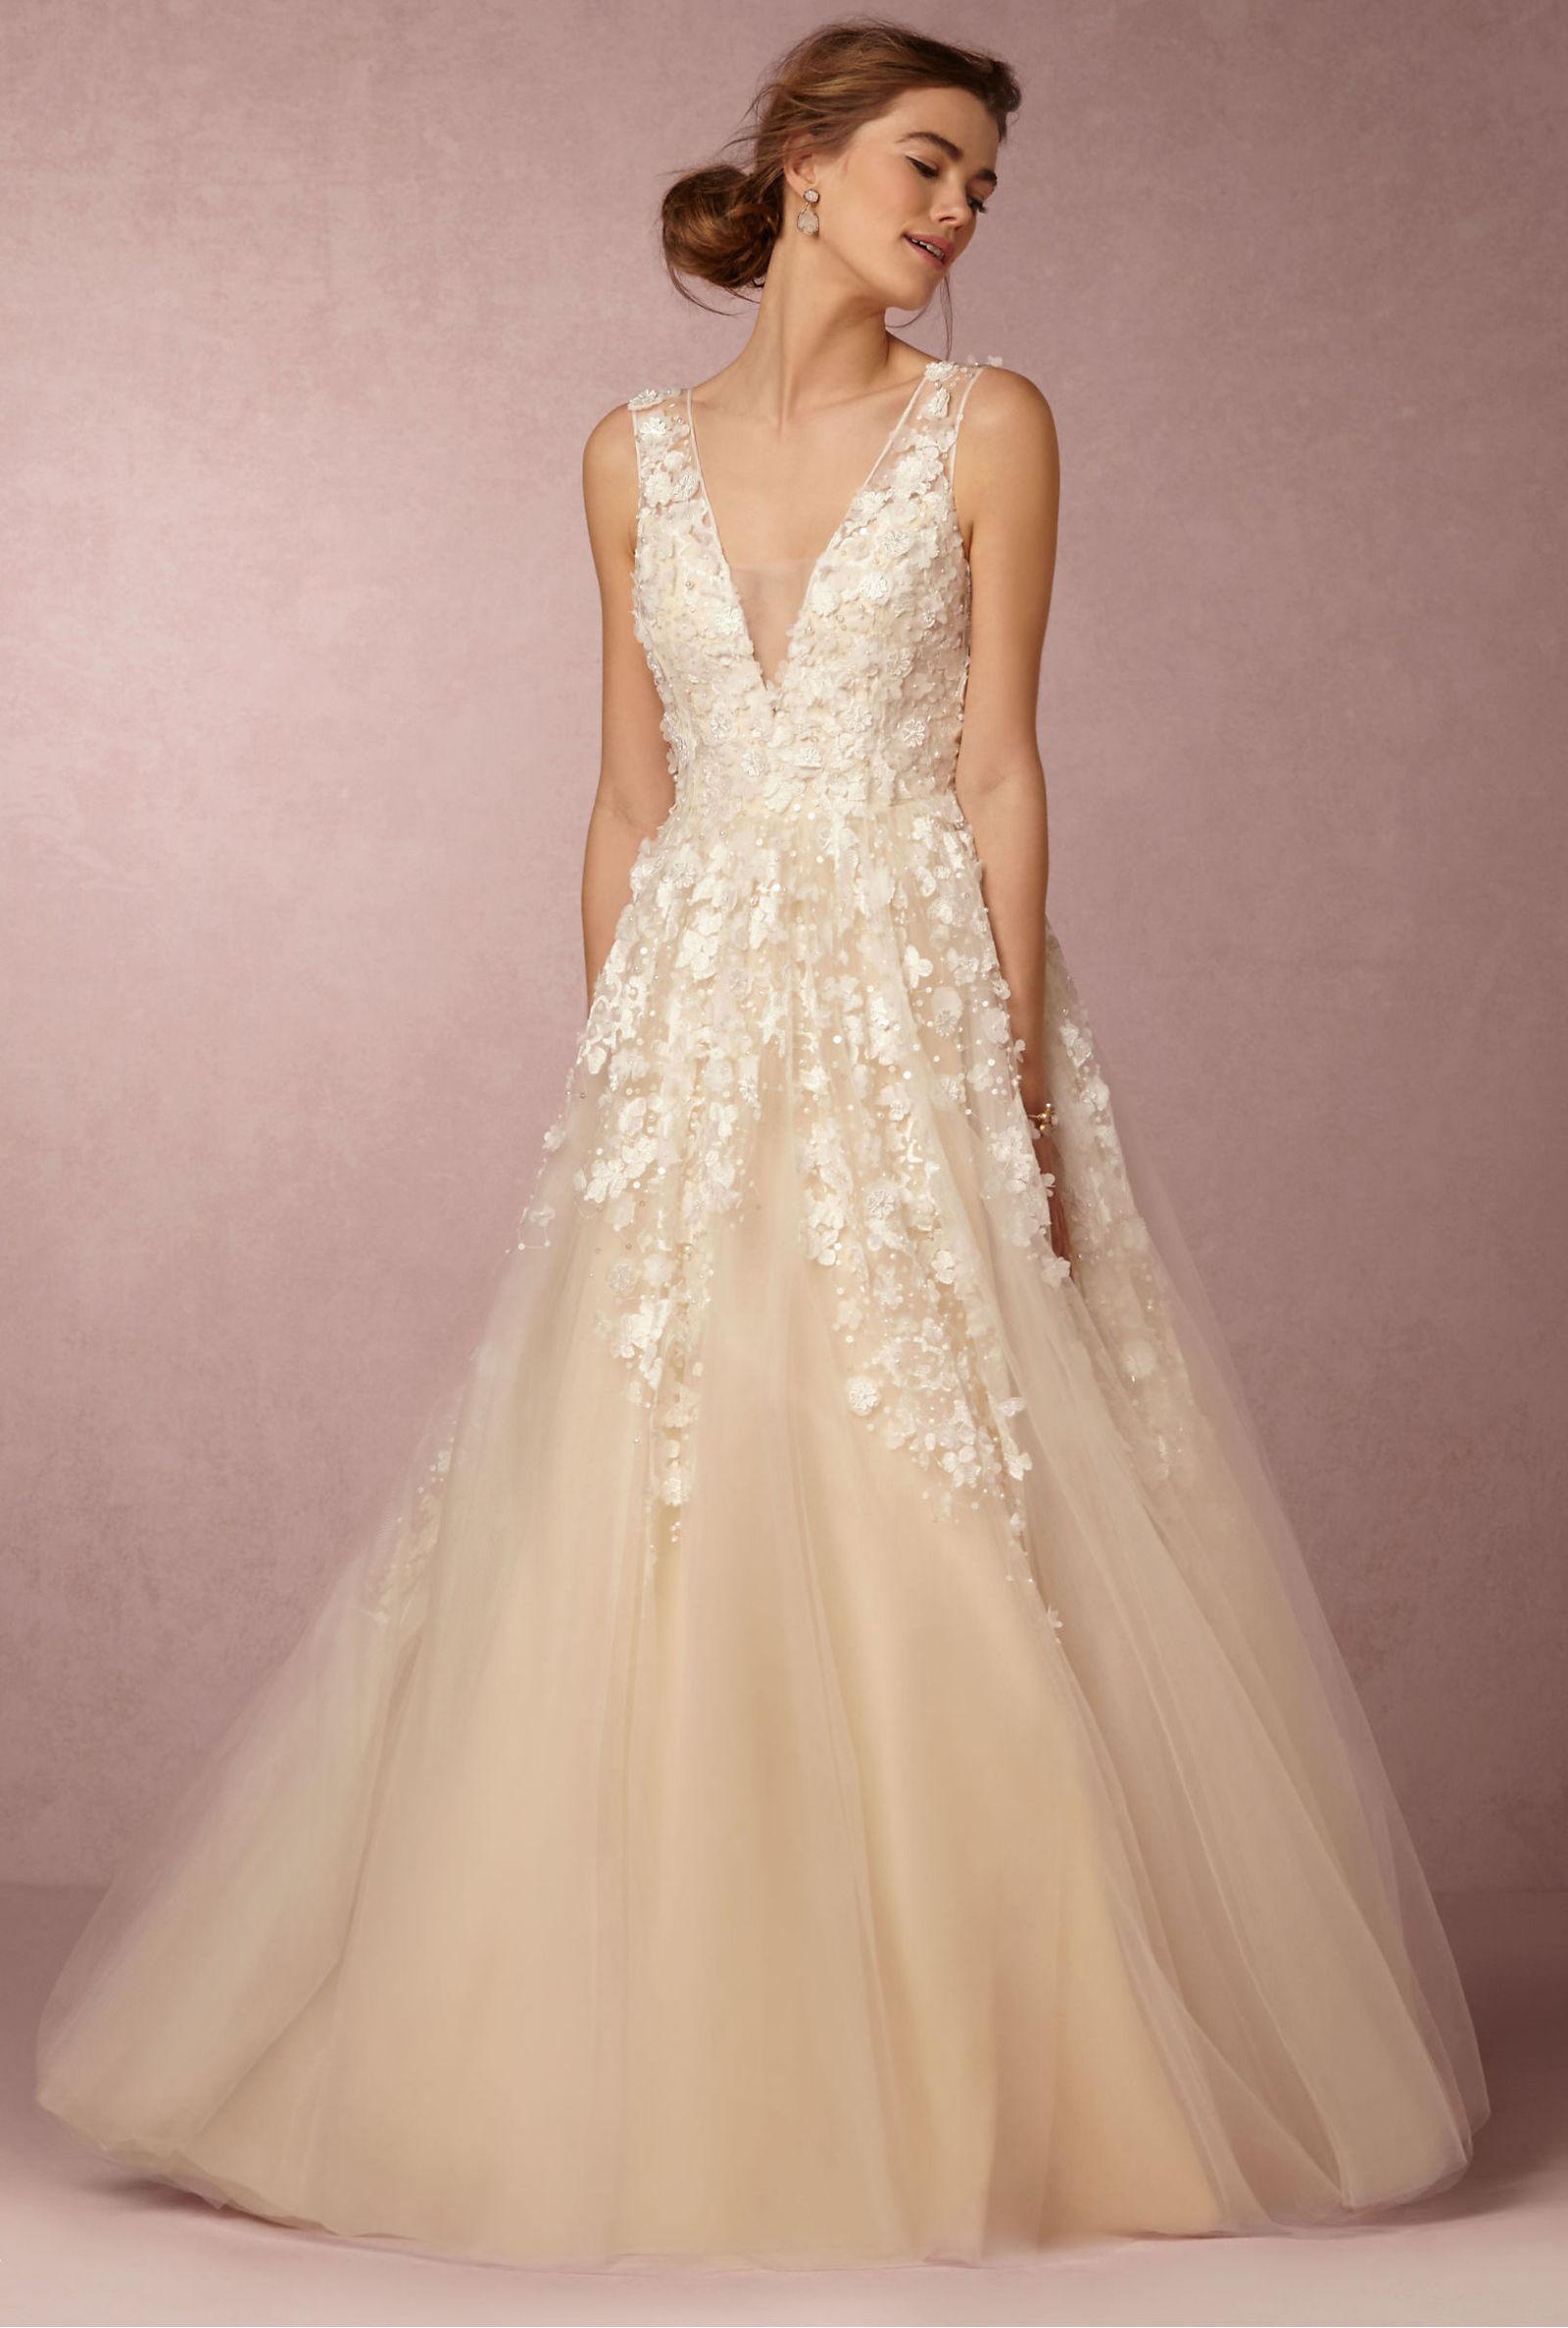 The dress gallery - 10 Best Winter Wedding Dresses For 2017 Wedding Dresses And Gowns For Winter